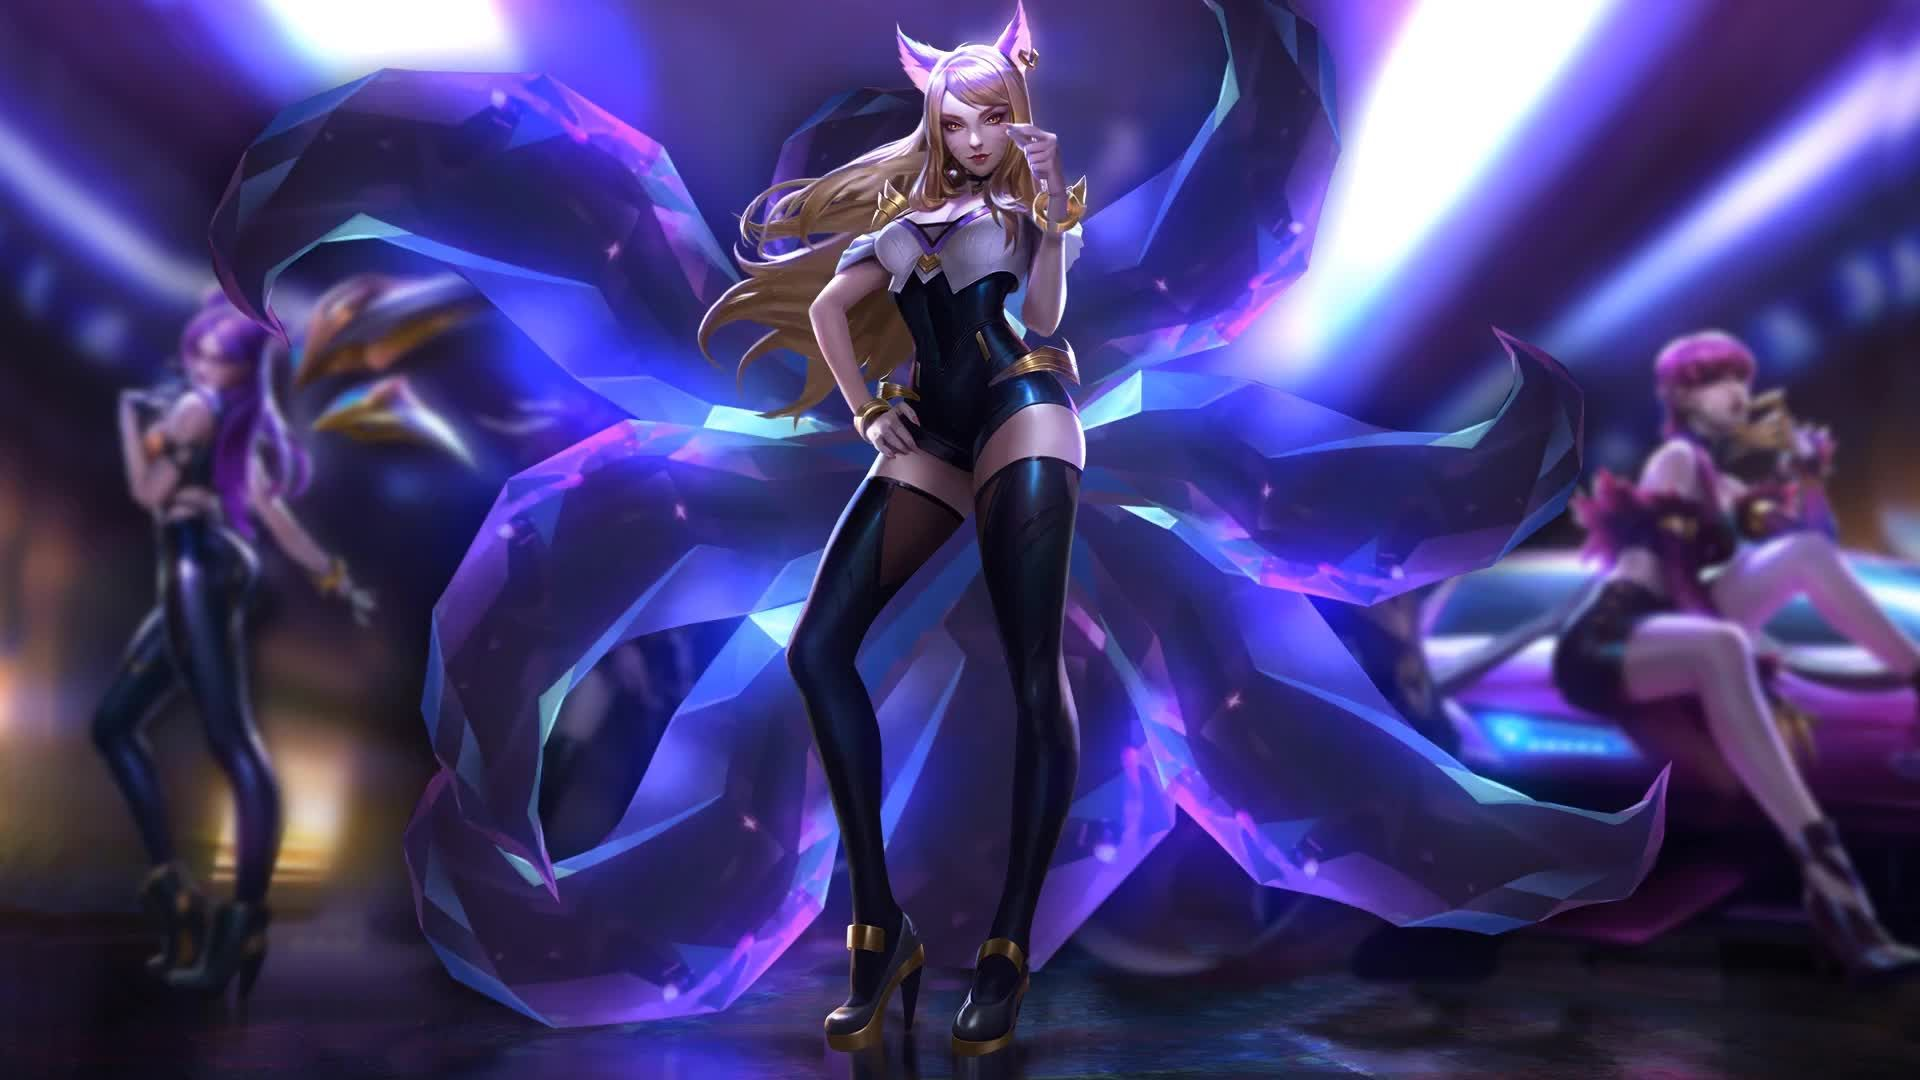 Kda Ahri Heart Live Wallpaper League Of Legends Characters Lol League Of Legends League Of Legends Video